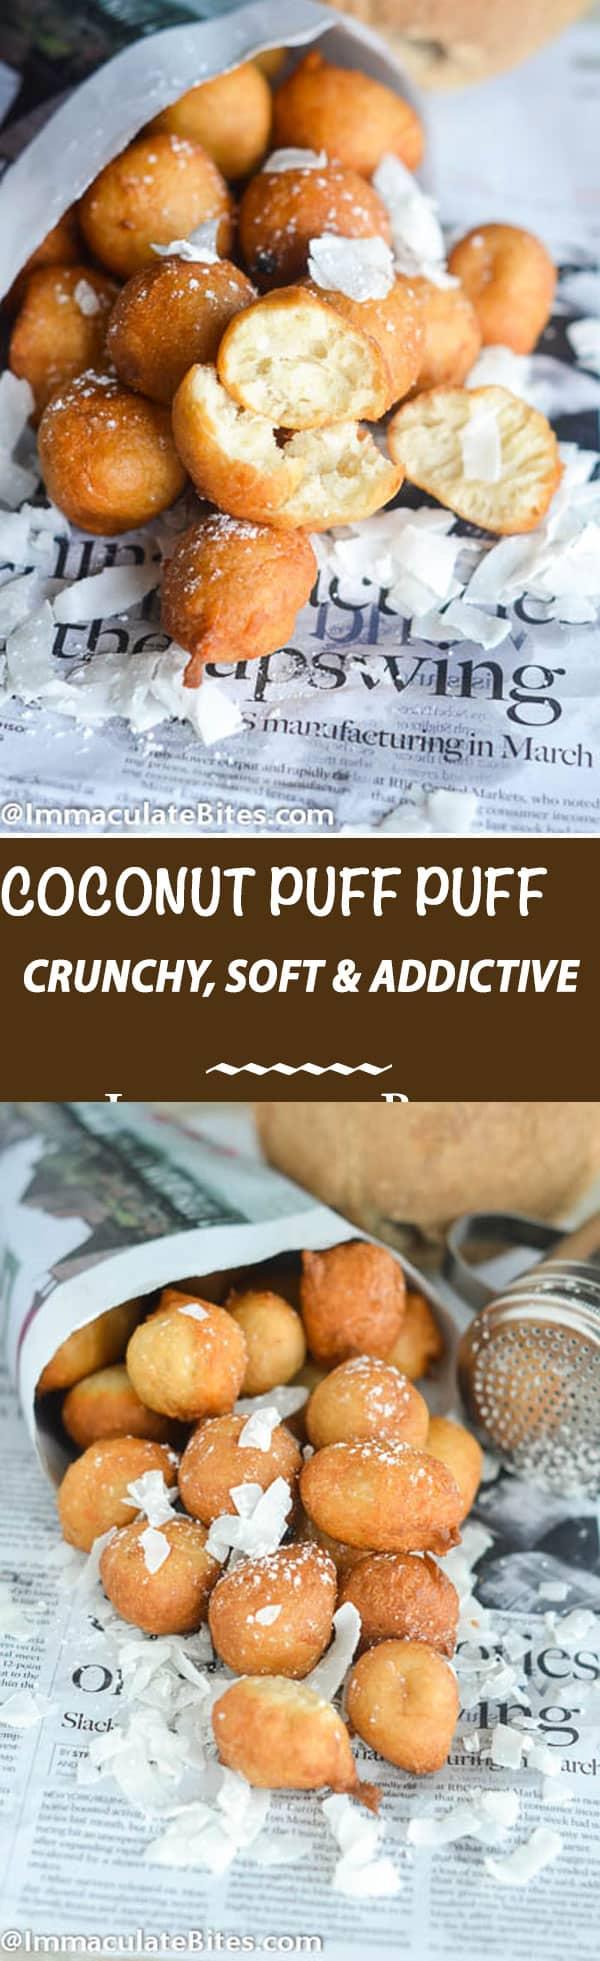 COCONUT-PUFF